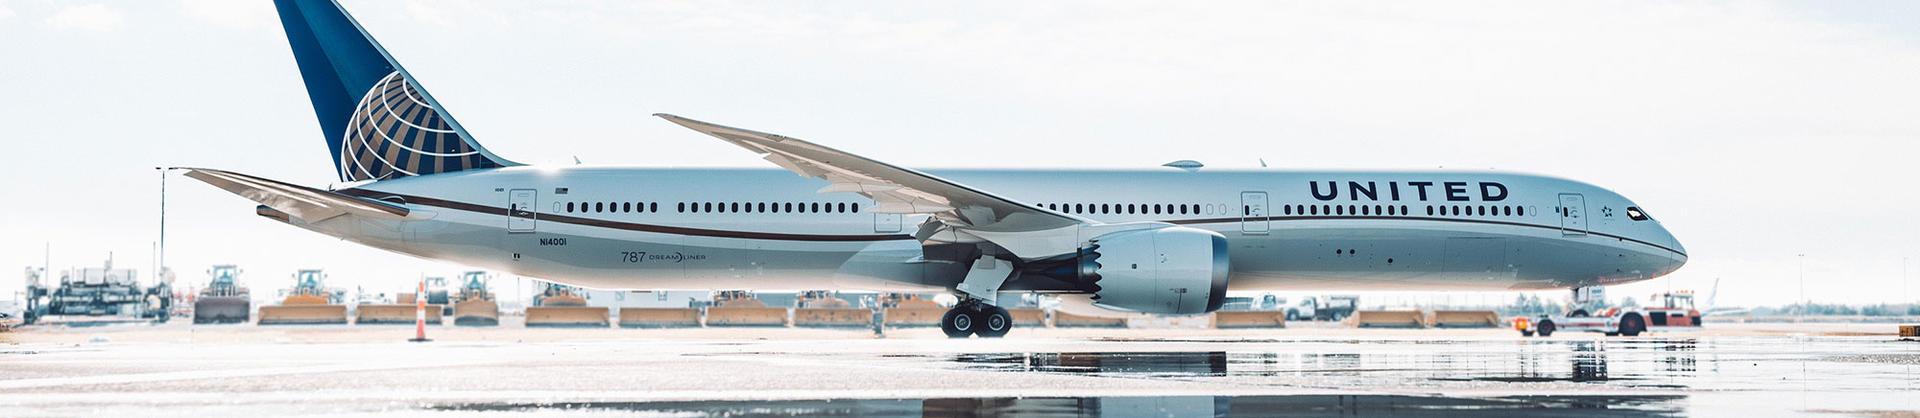 United Airlines Dreamliner